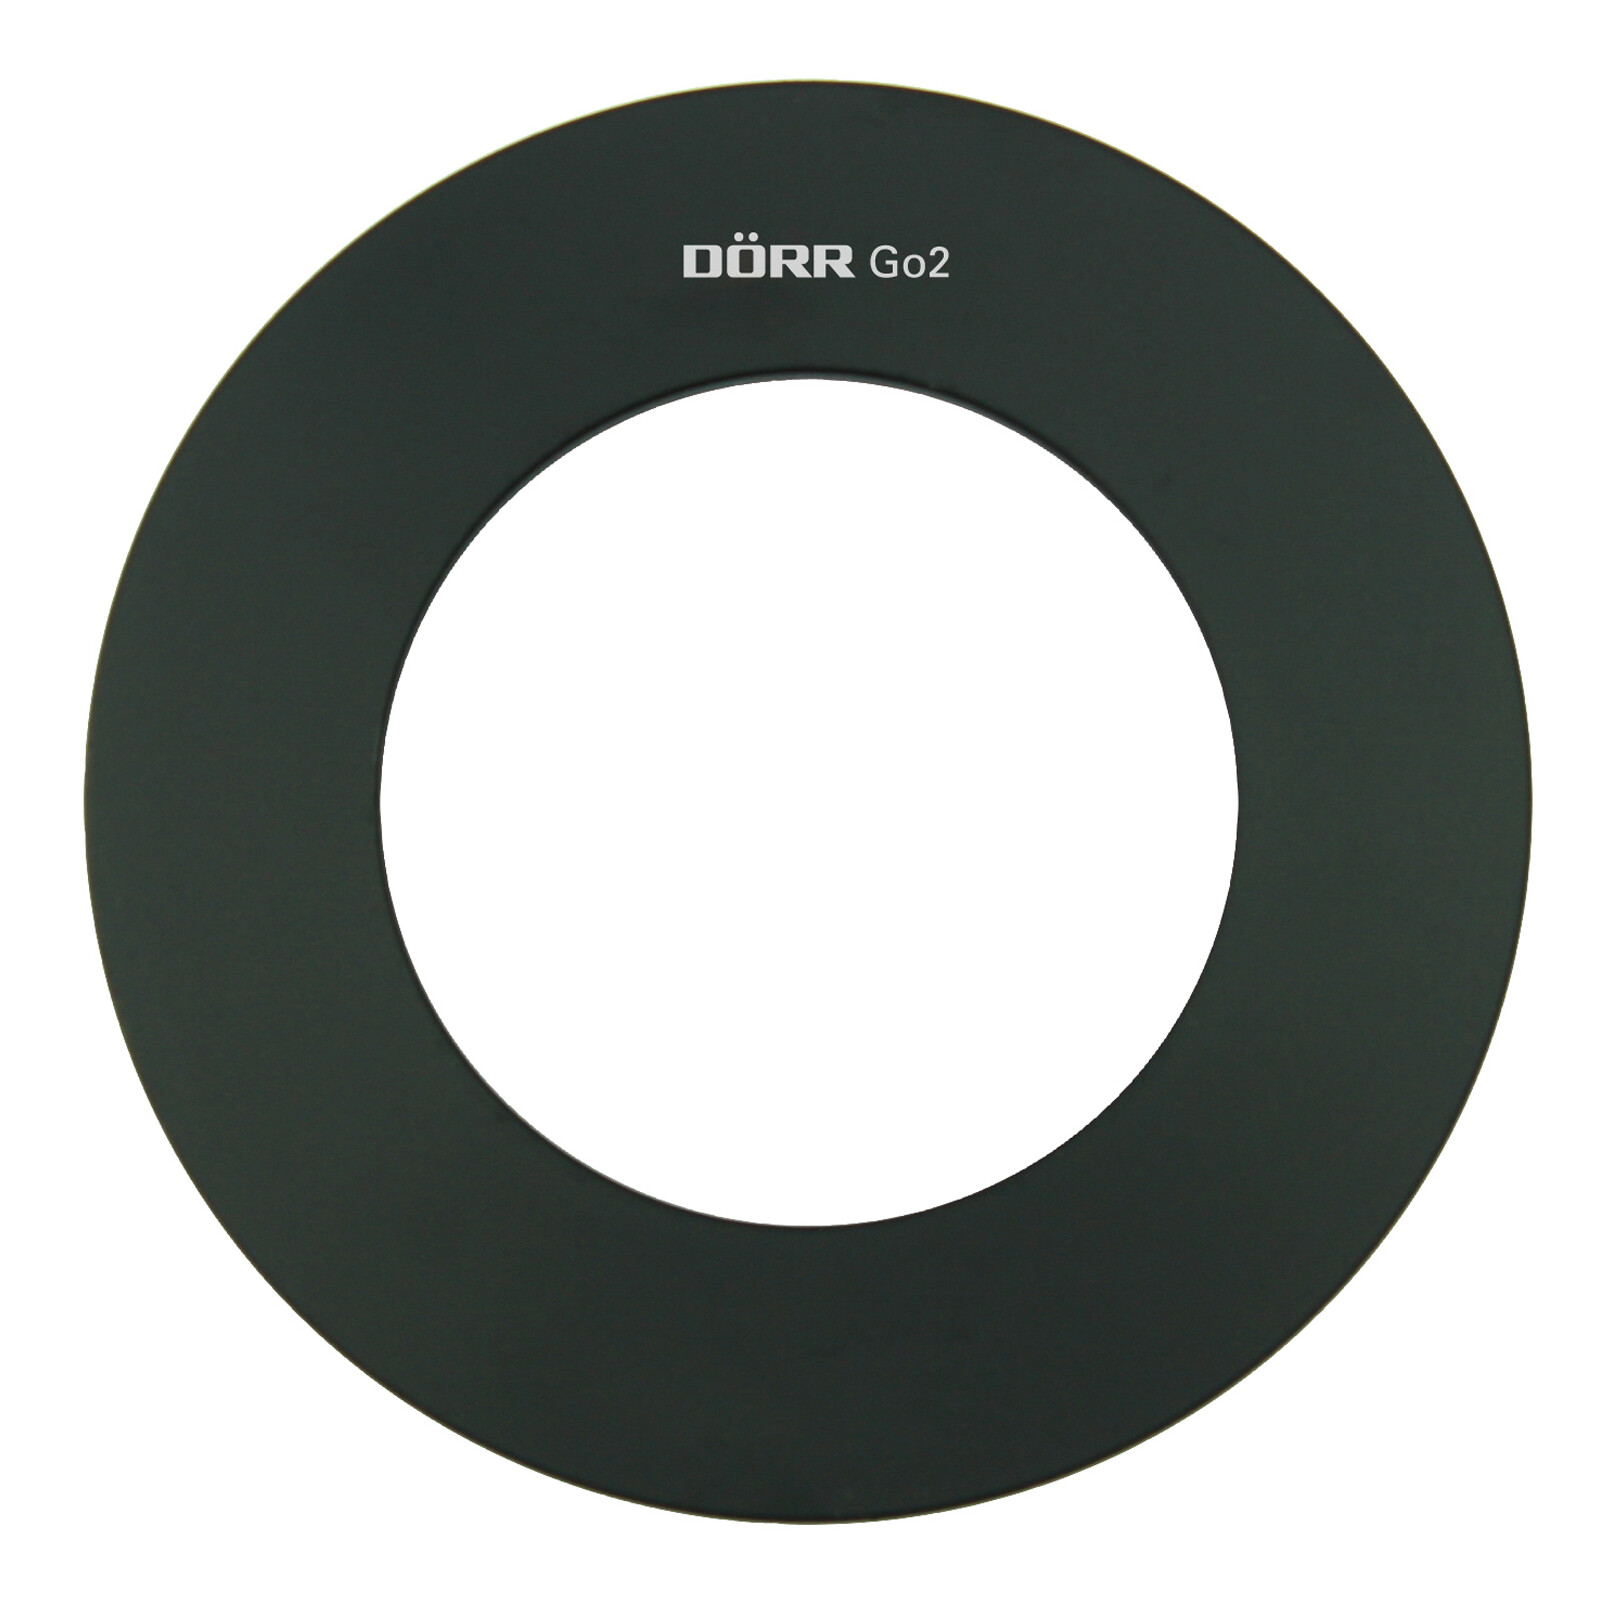 Dörr Go2 Metall Anschlussring 37mm